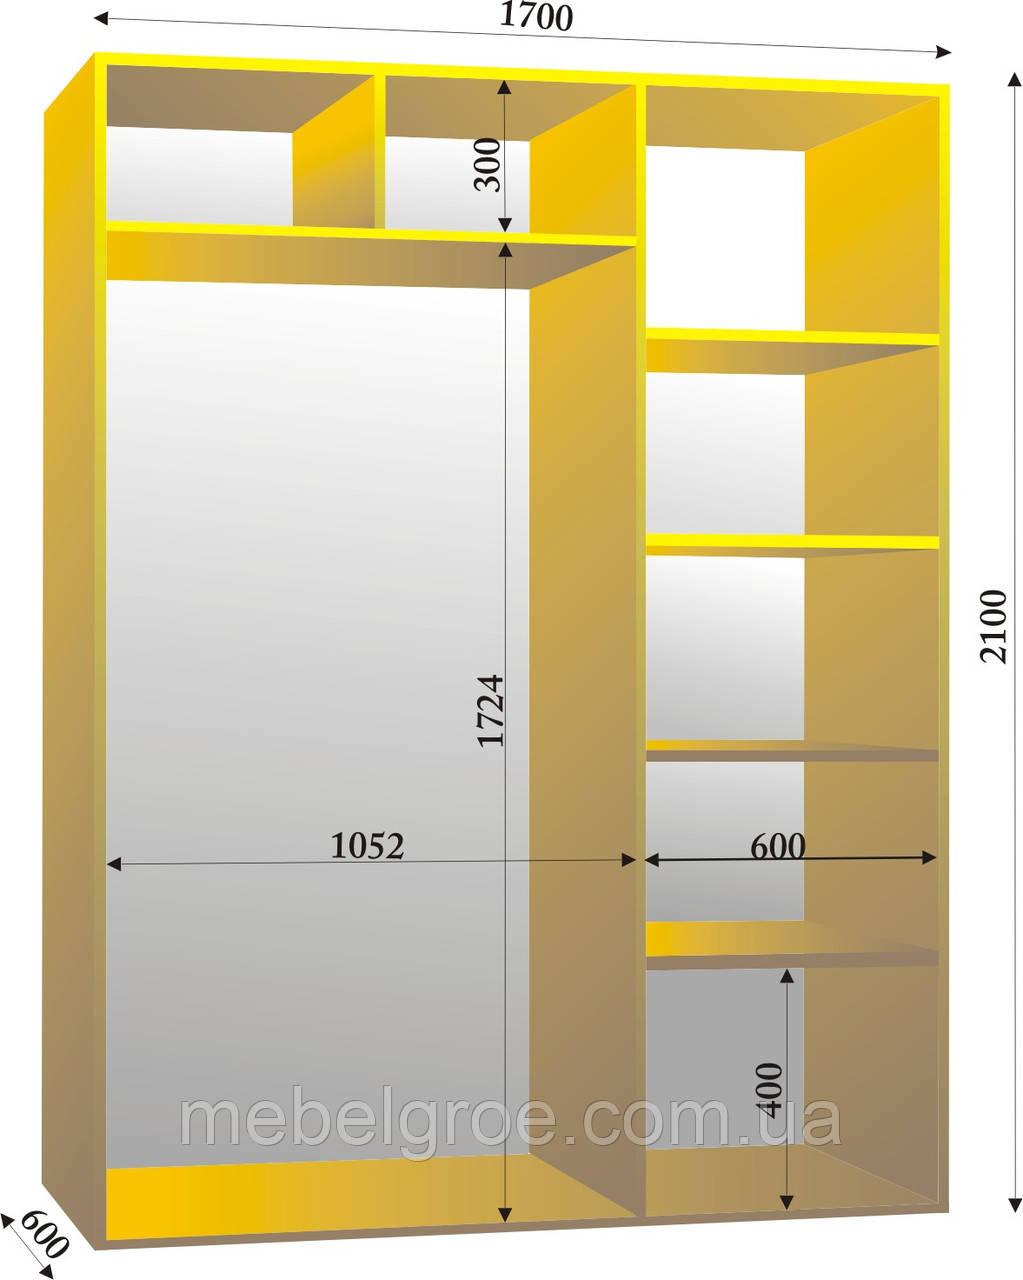 Шкаф-купе двухдверный 1700х600х2100 тм Эксклюзив